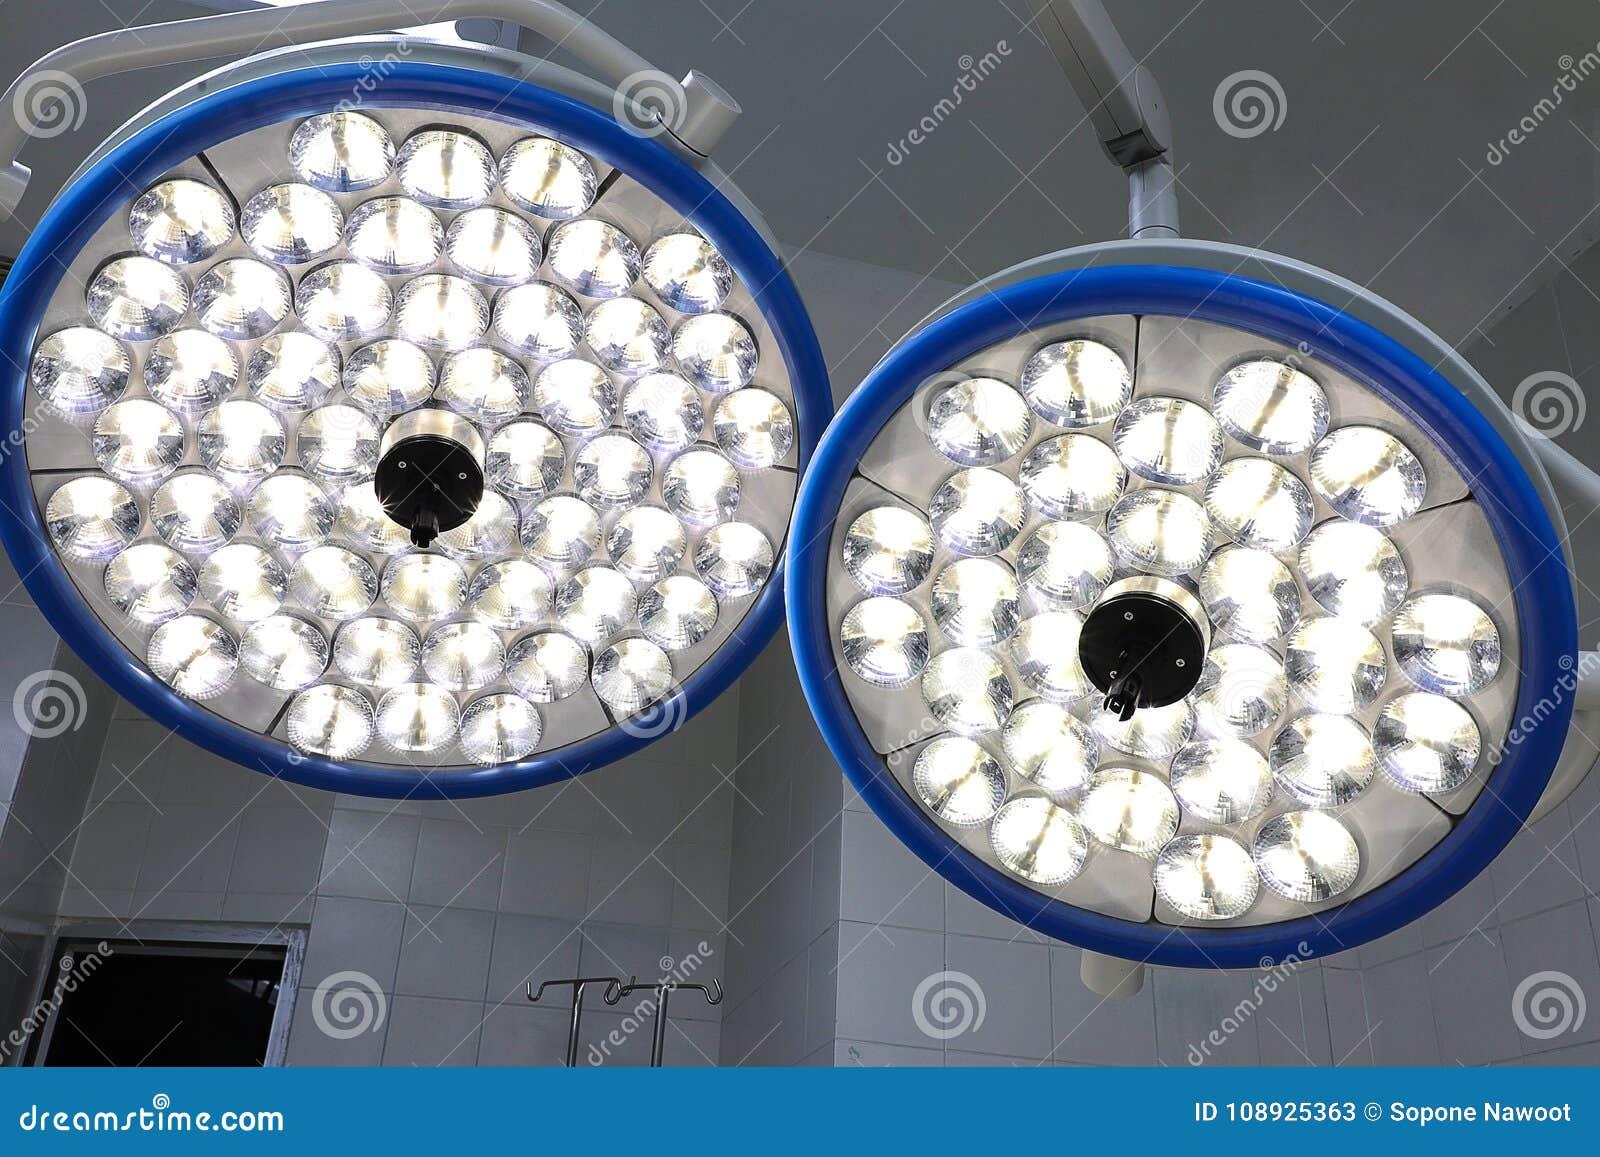 Operationsraumlampen